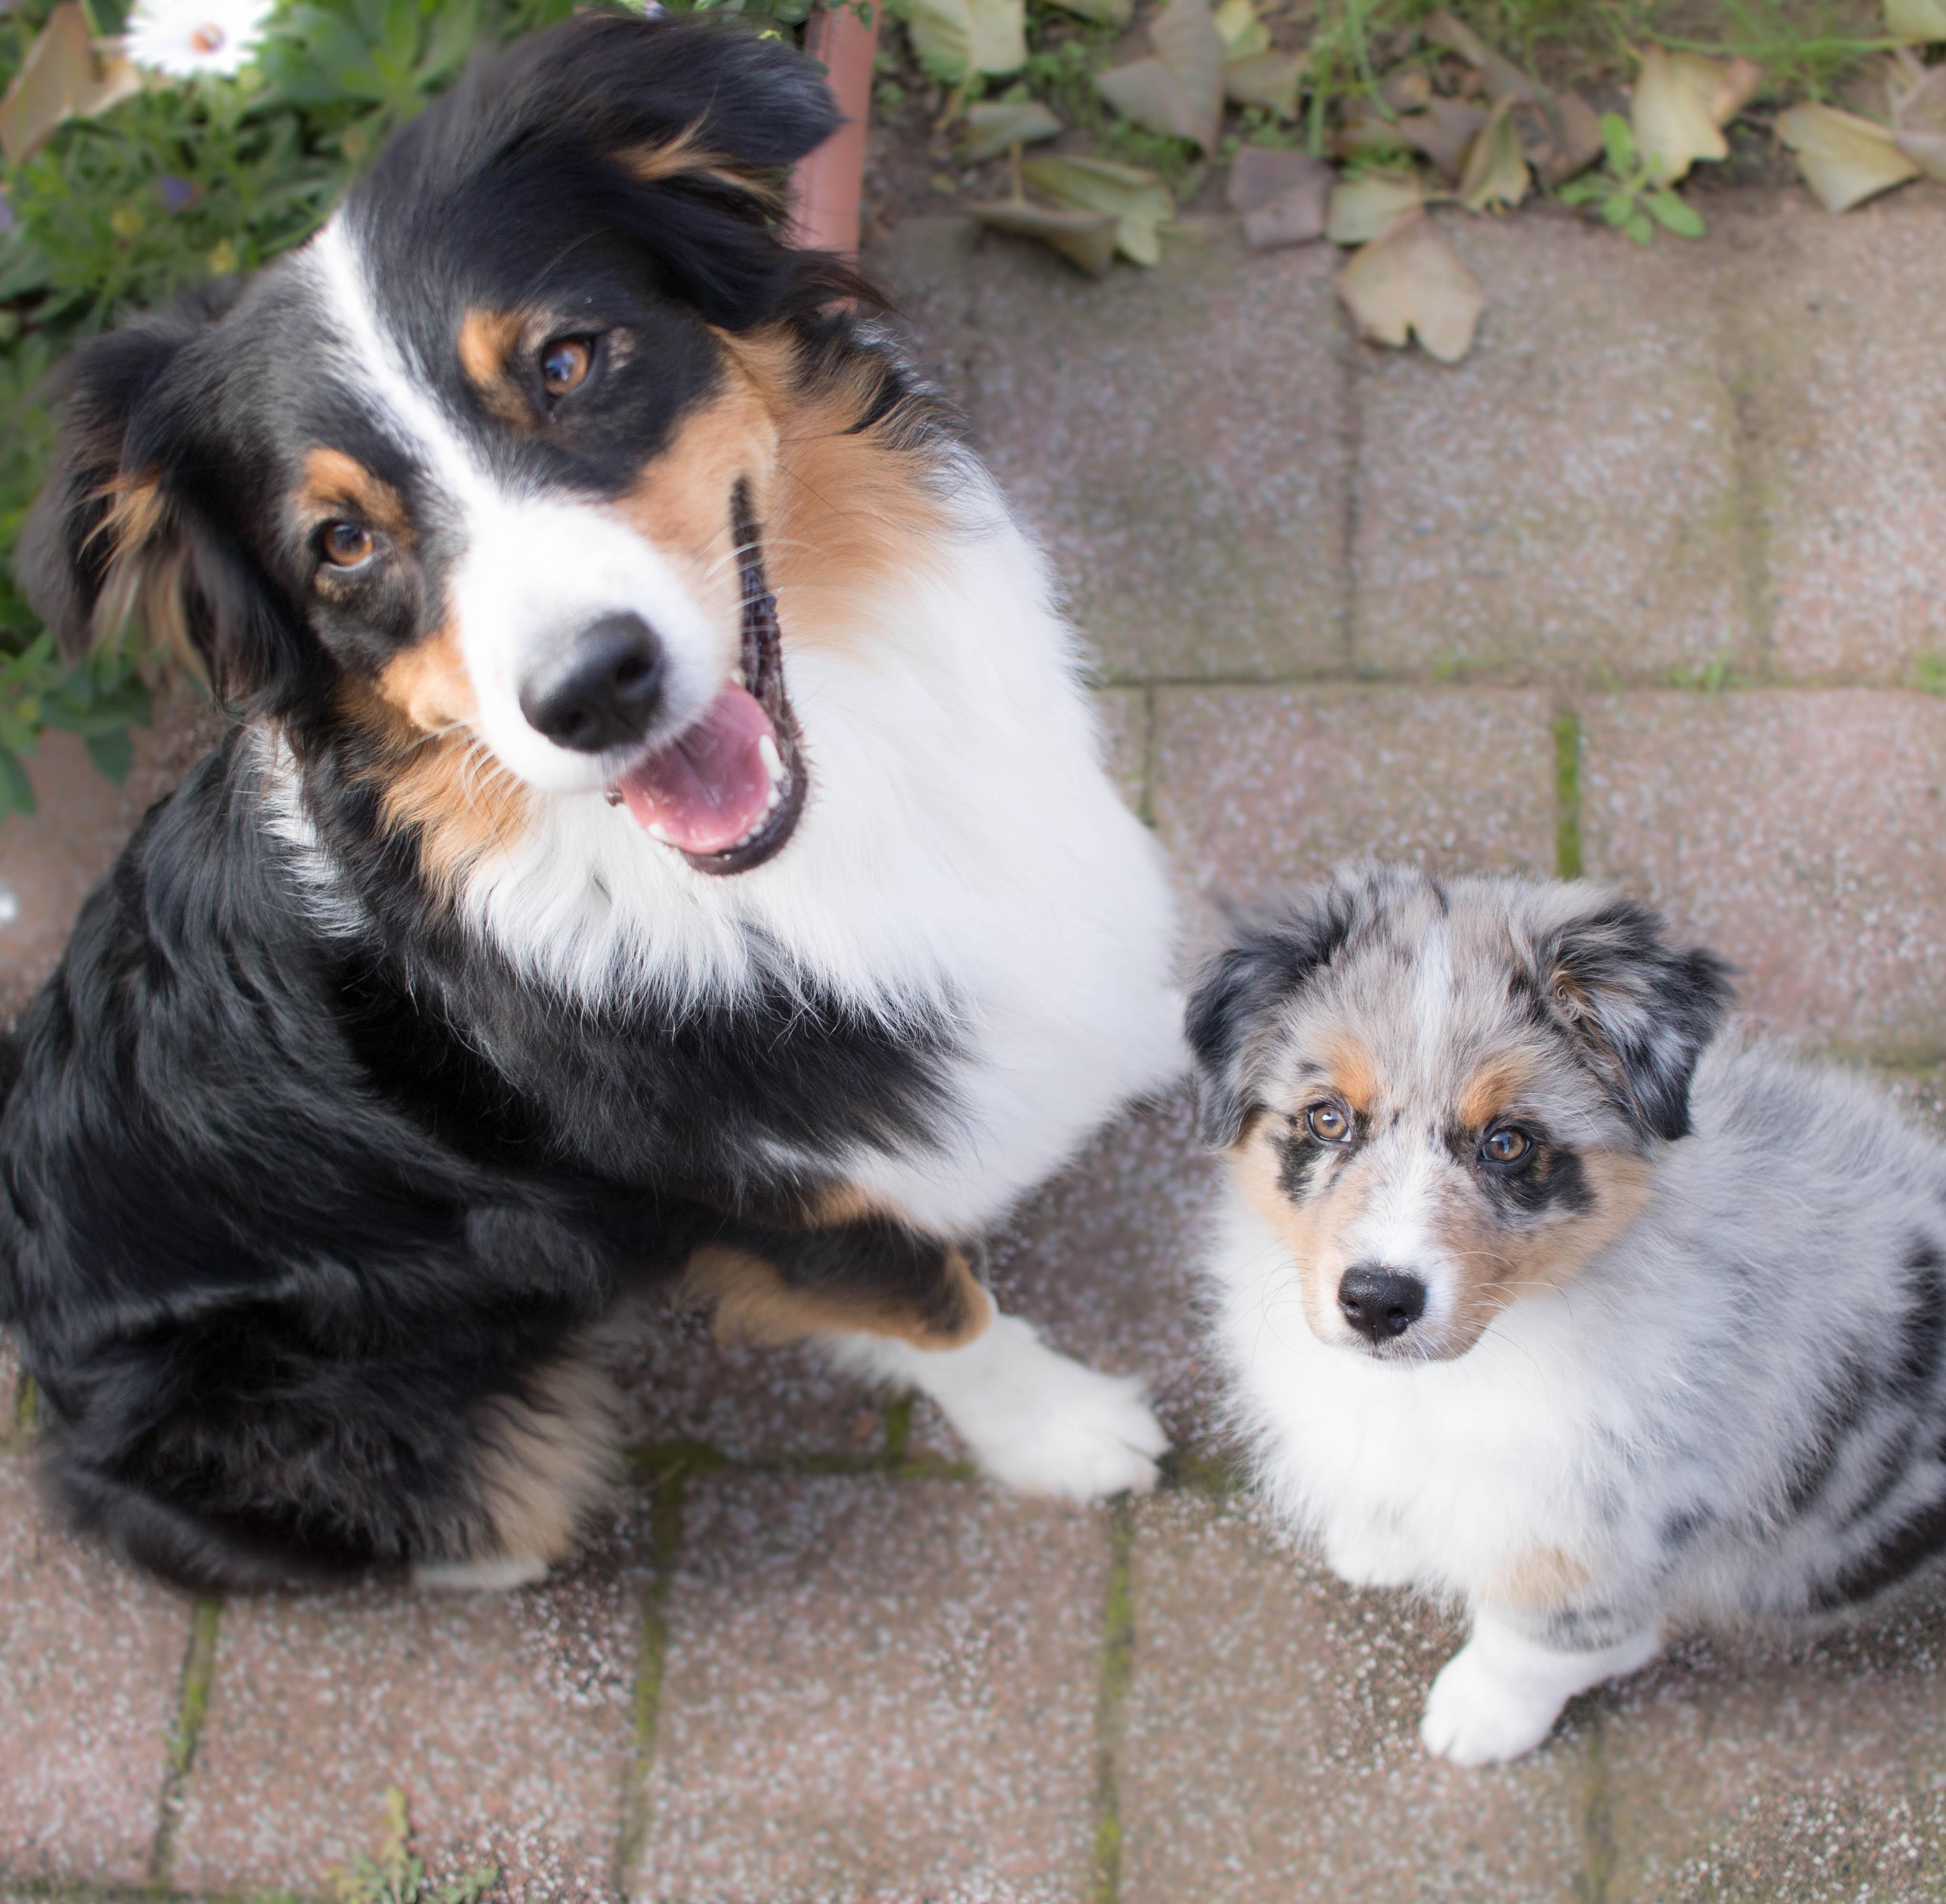 Hundeblog_zwei_hunde_umstellung_dogsoulmate20181-244